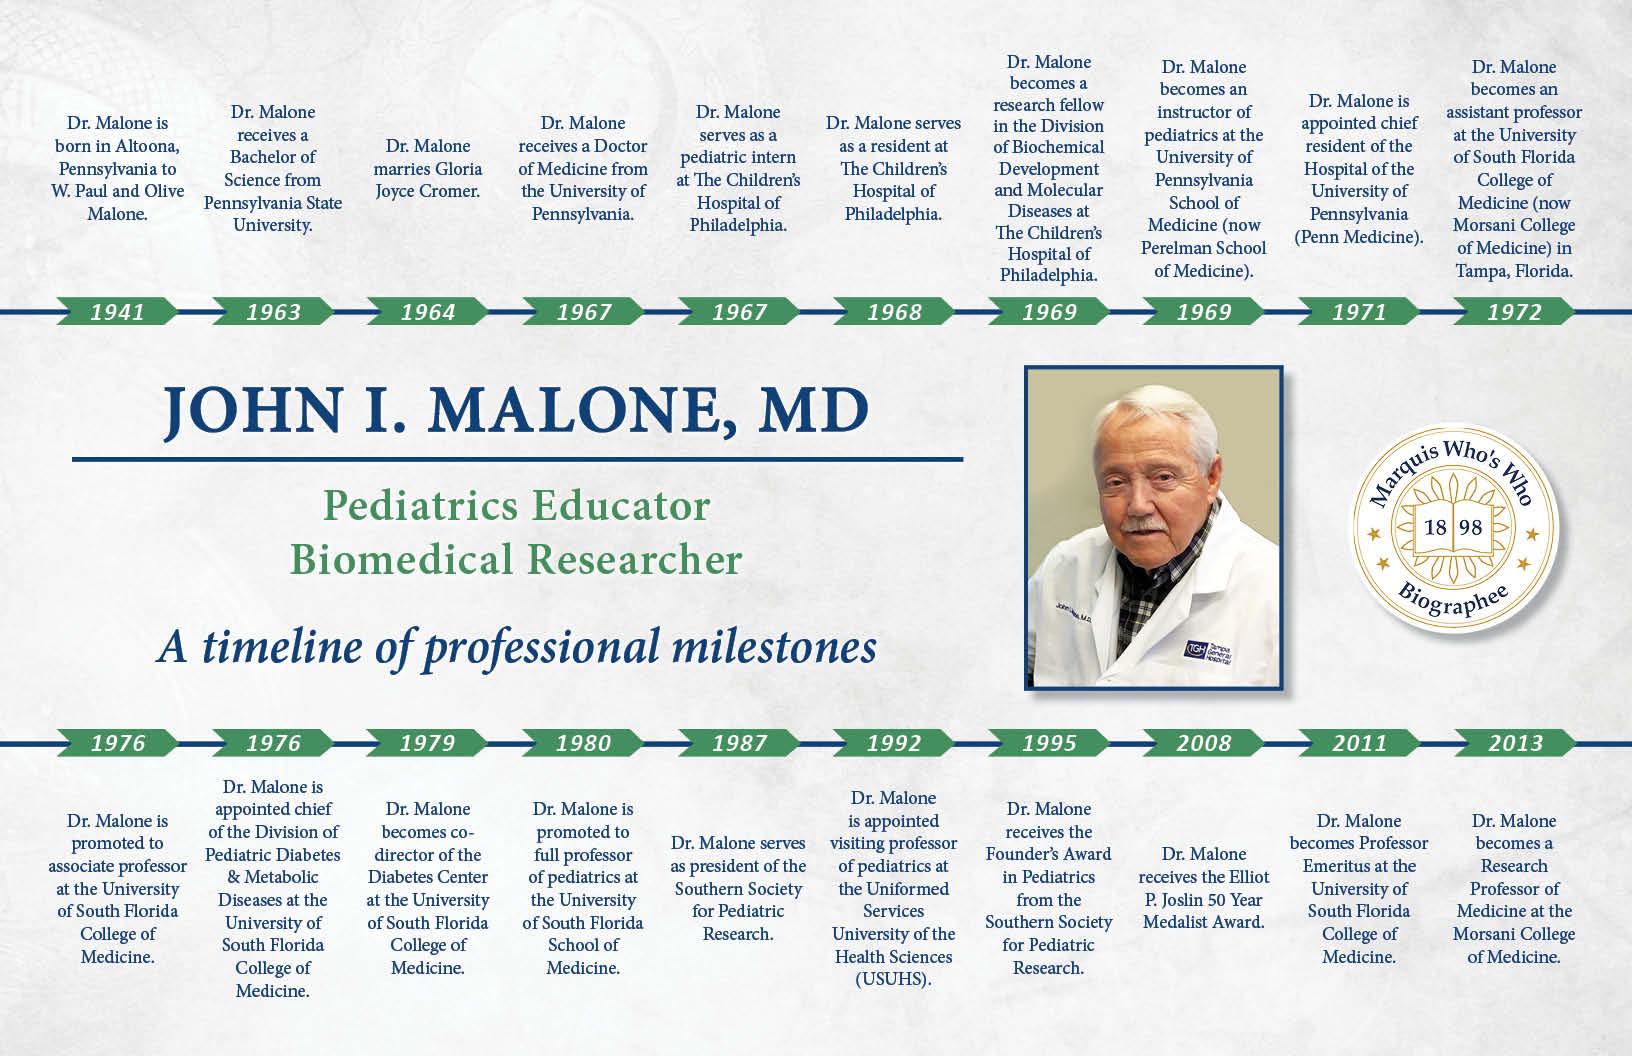 John Malone Professional Milestones